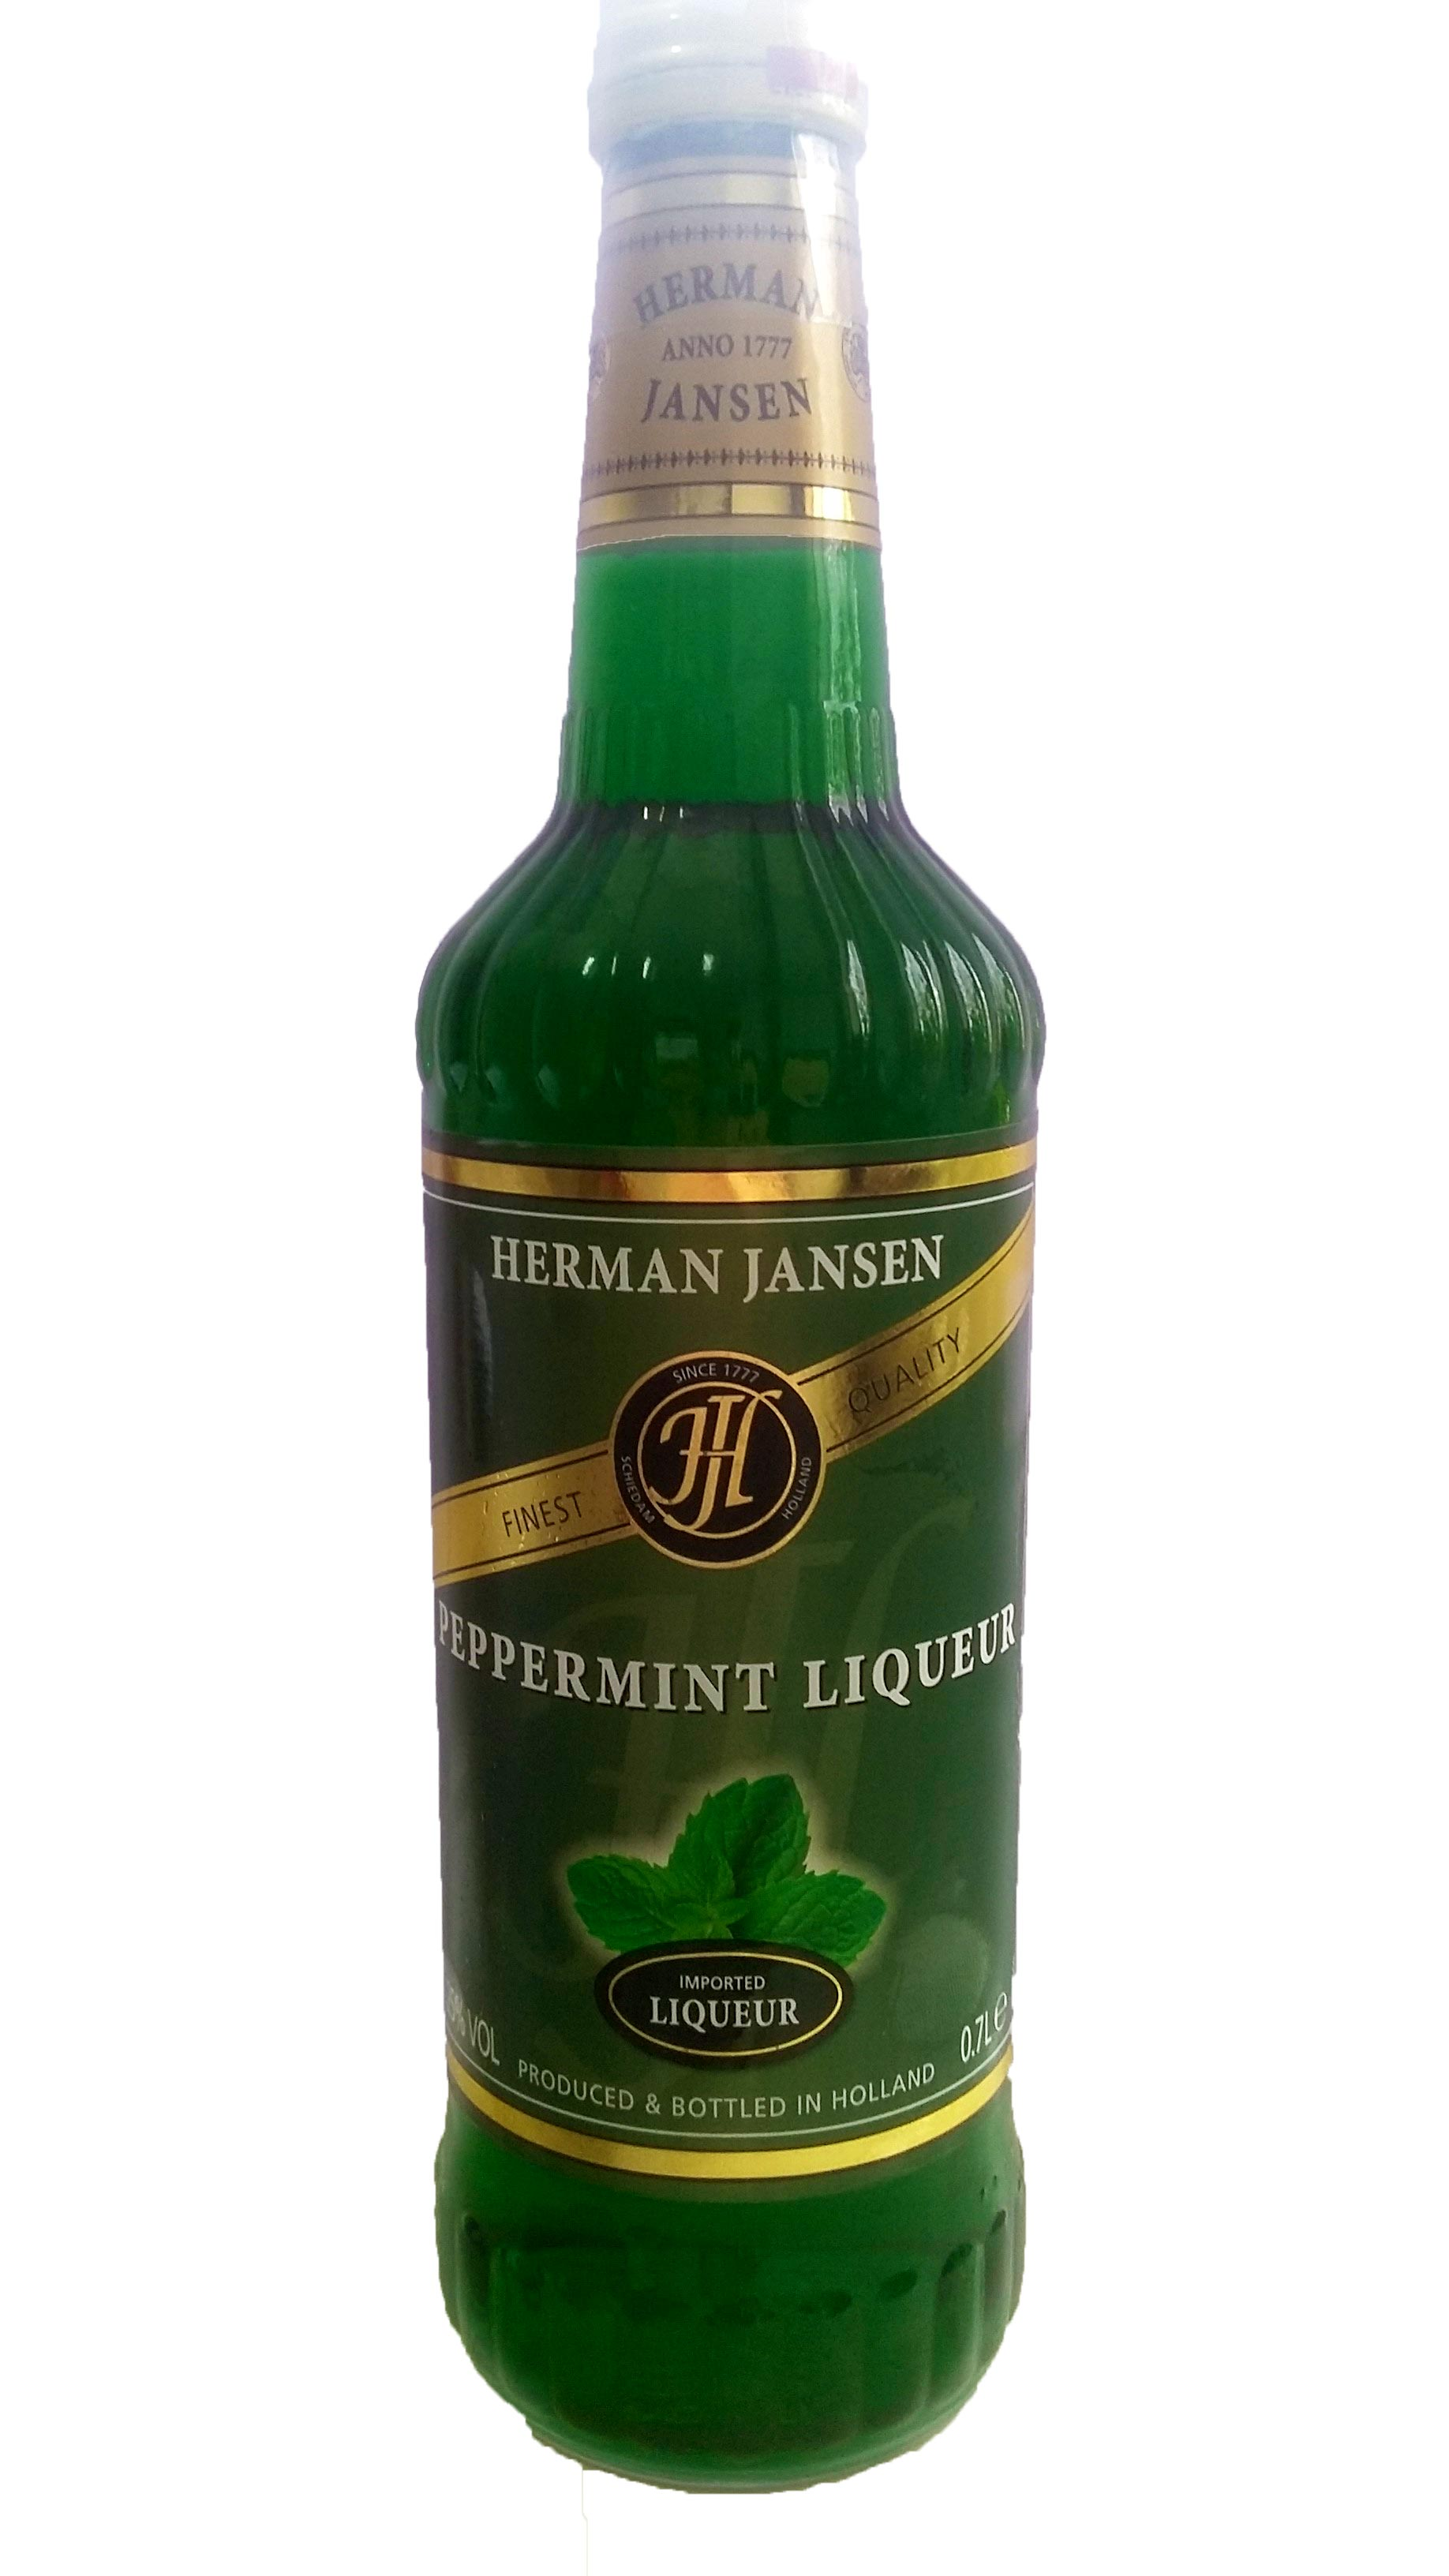 Herman Jansen Peppermint Lichior 25% 0,7L